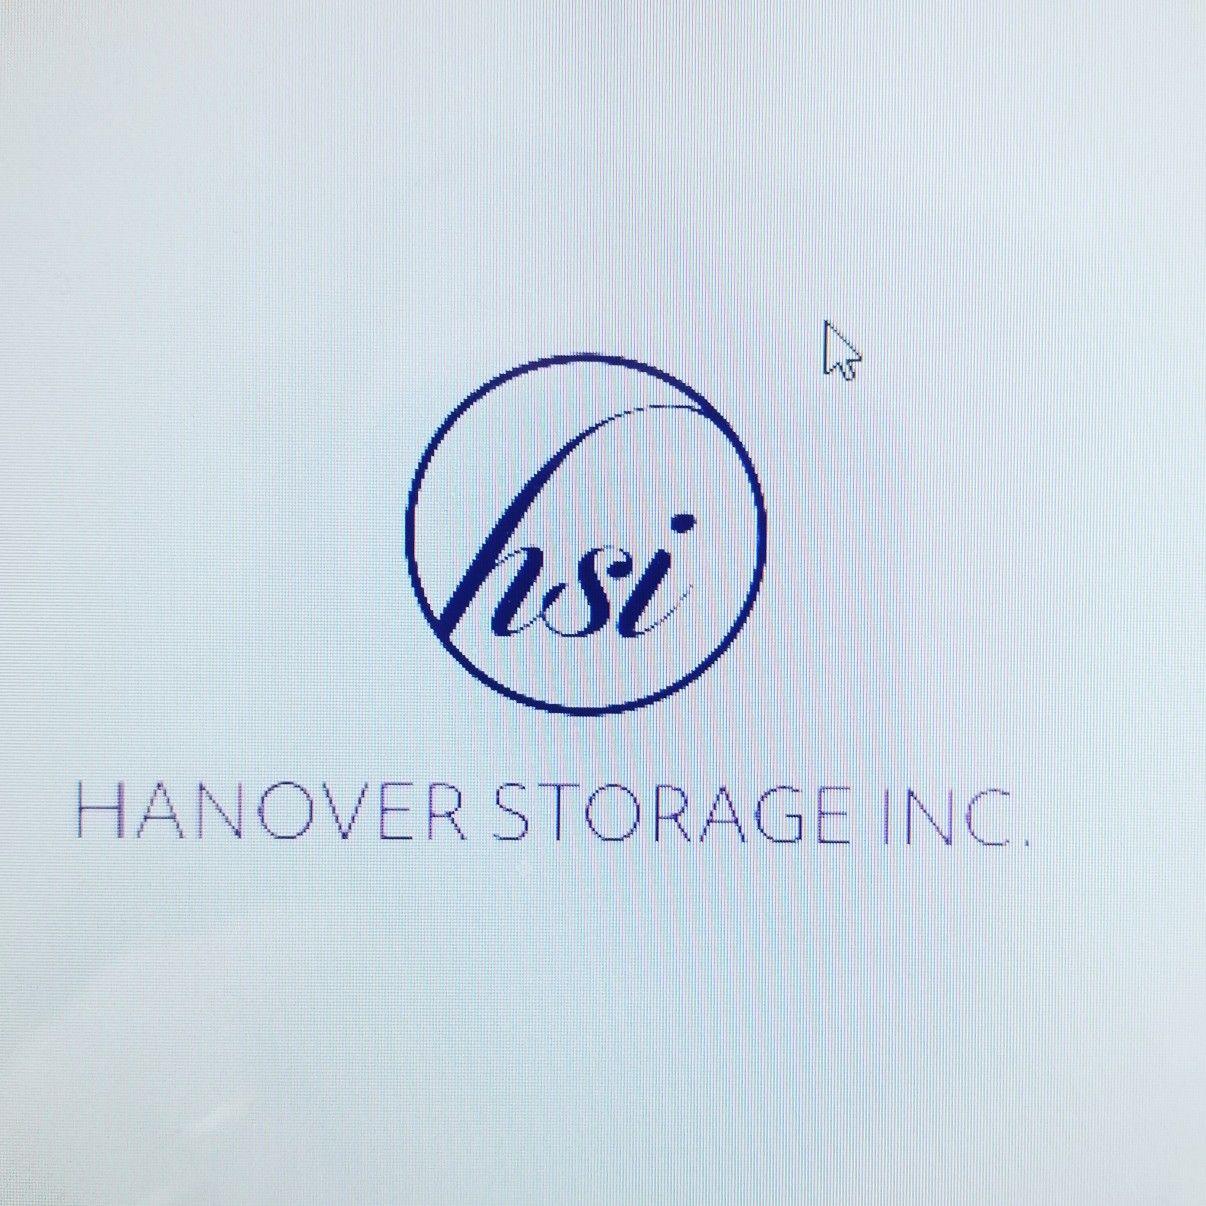 Storage facility in 2020 Storage facility, Storage, Hanover